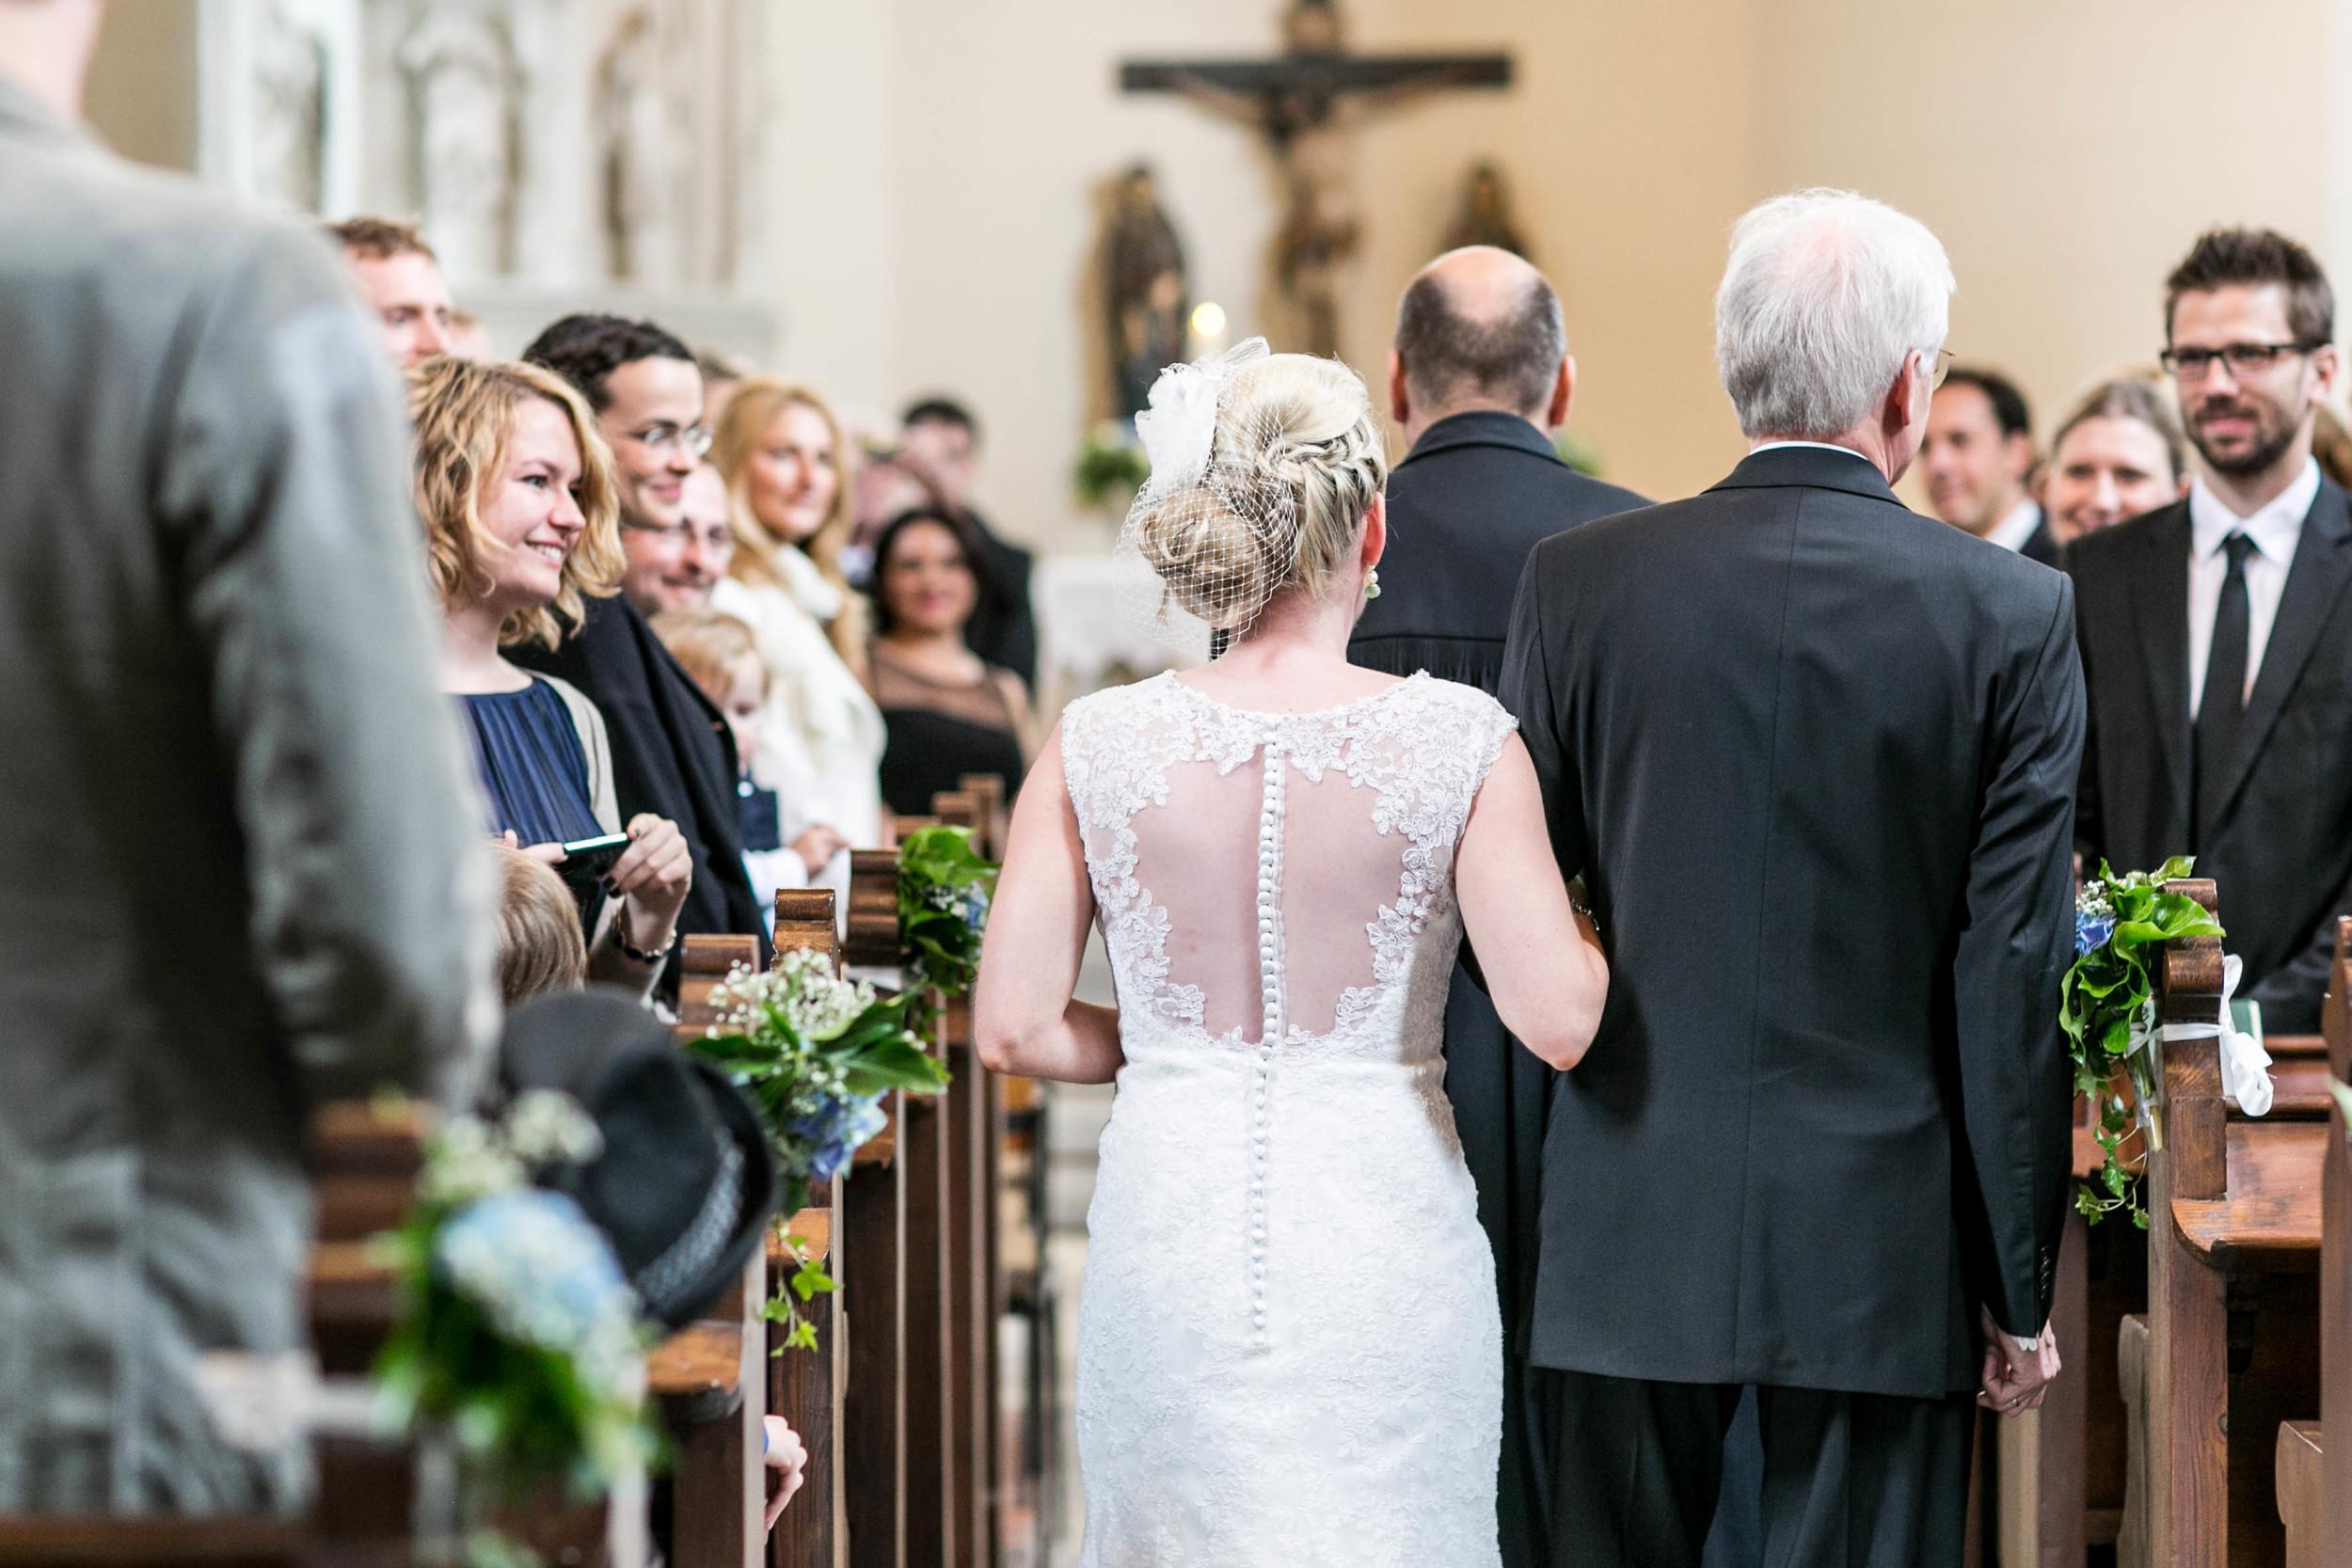 Hochzeitsfotografie Berlin_Fran Burrows Fotografie_11.jpg